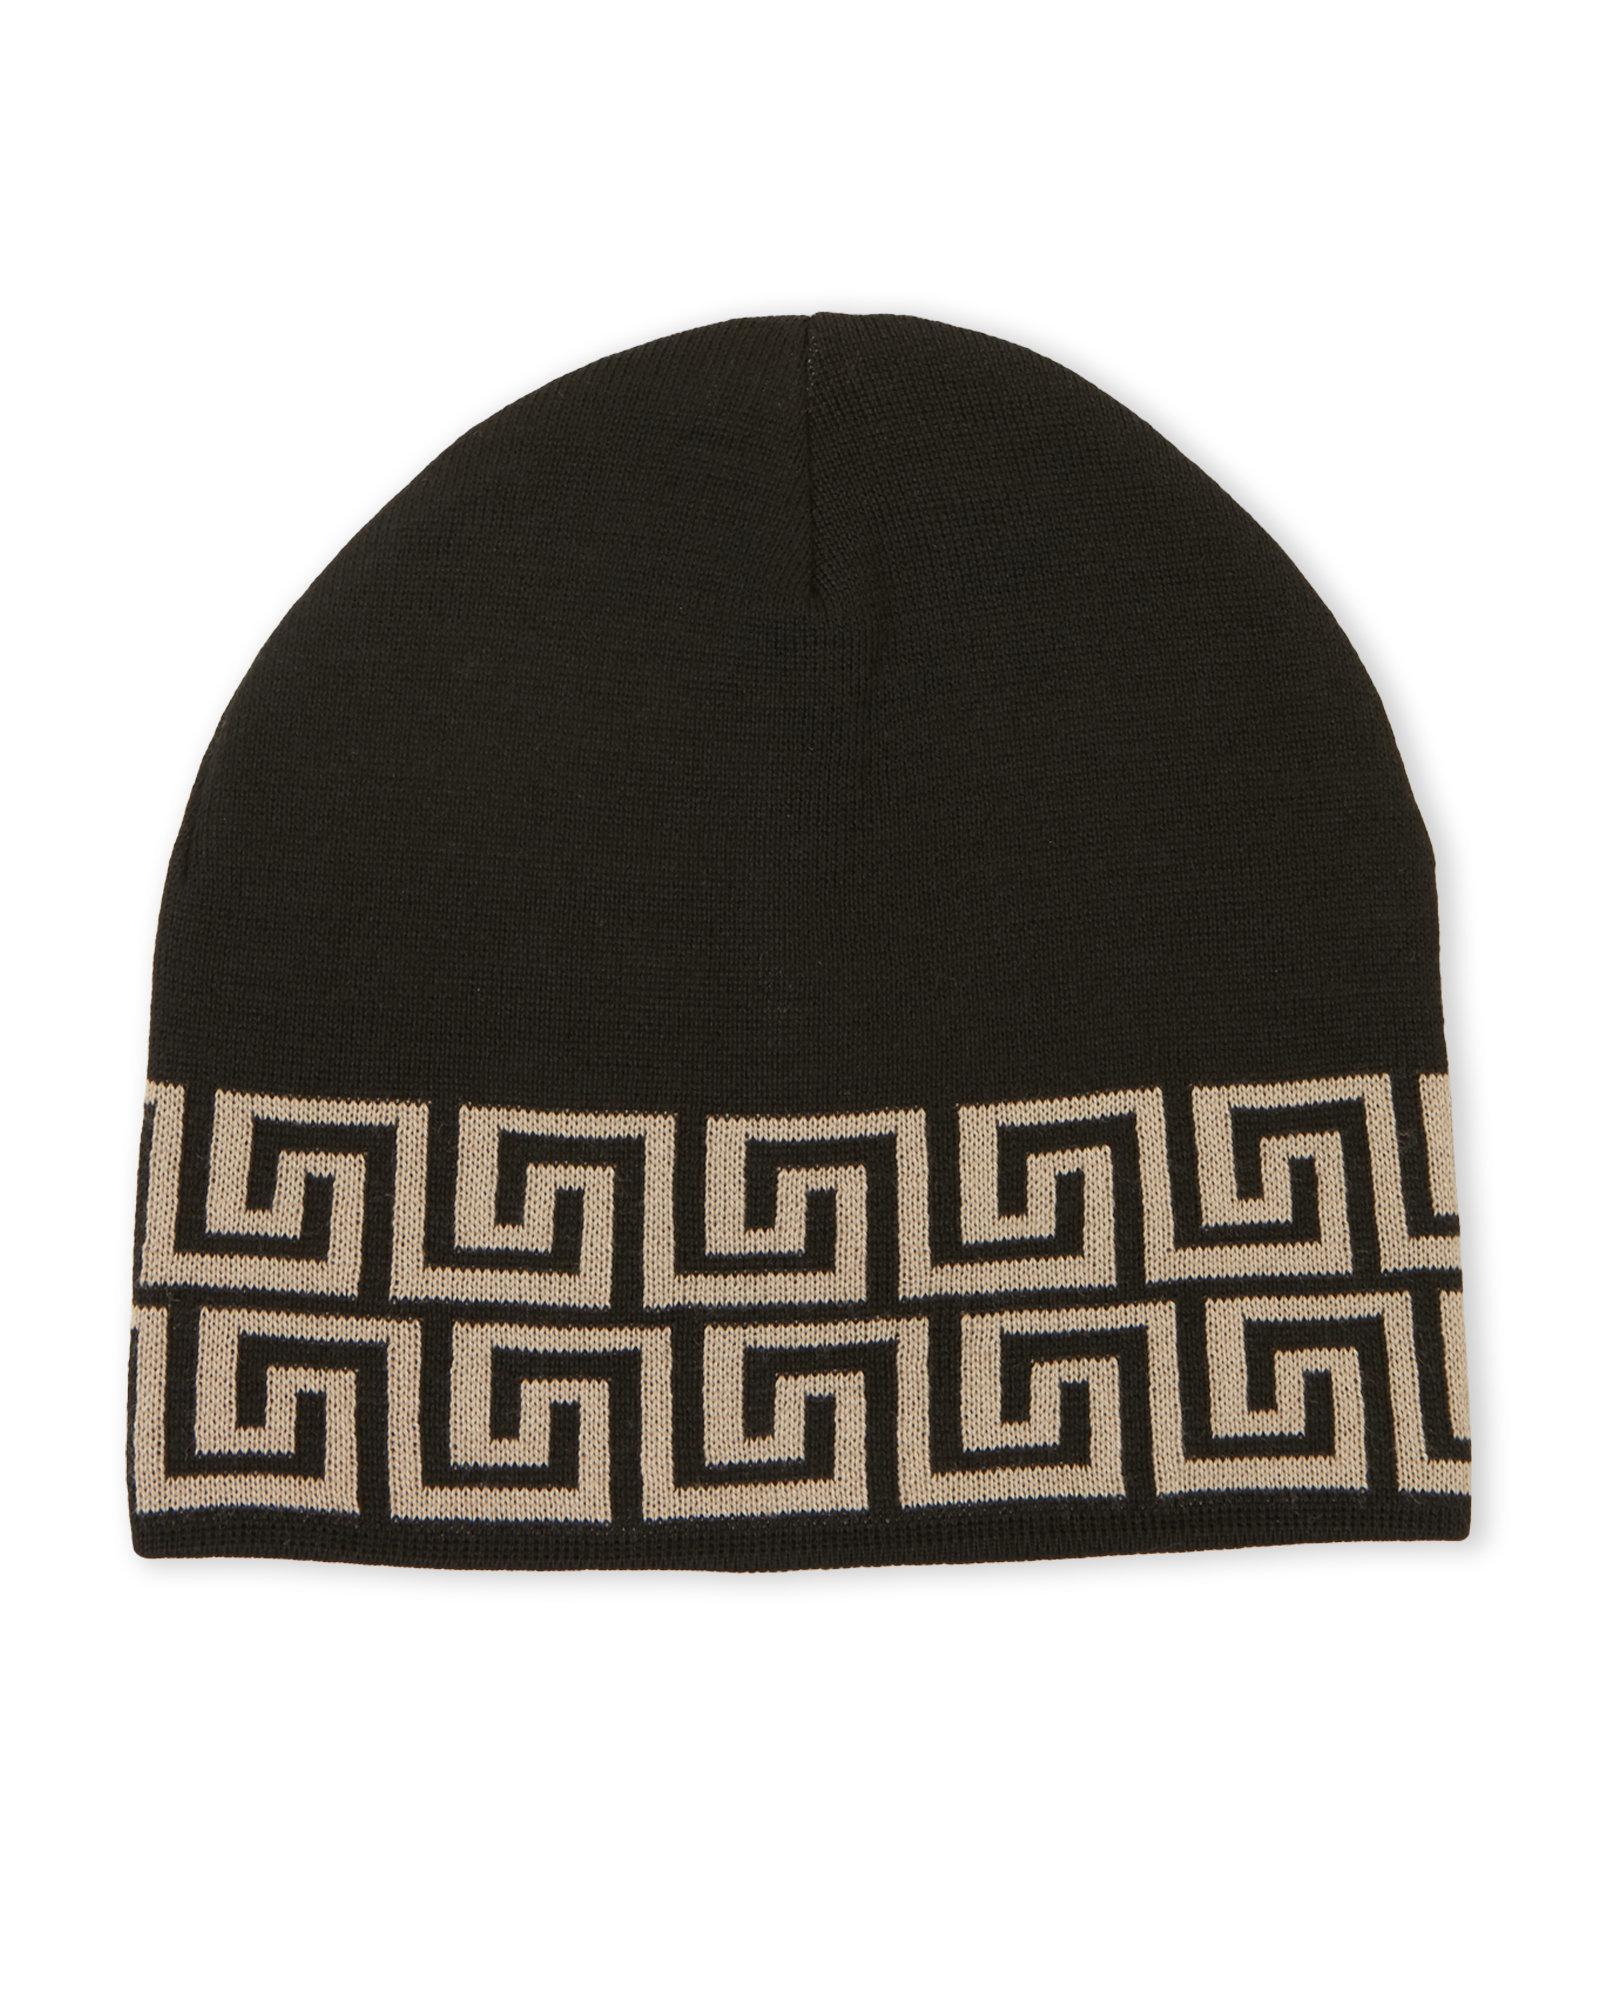 ff628a57 ... switzerland lyst versace greek key print knit hat for men c2882 55063